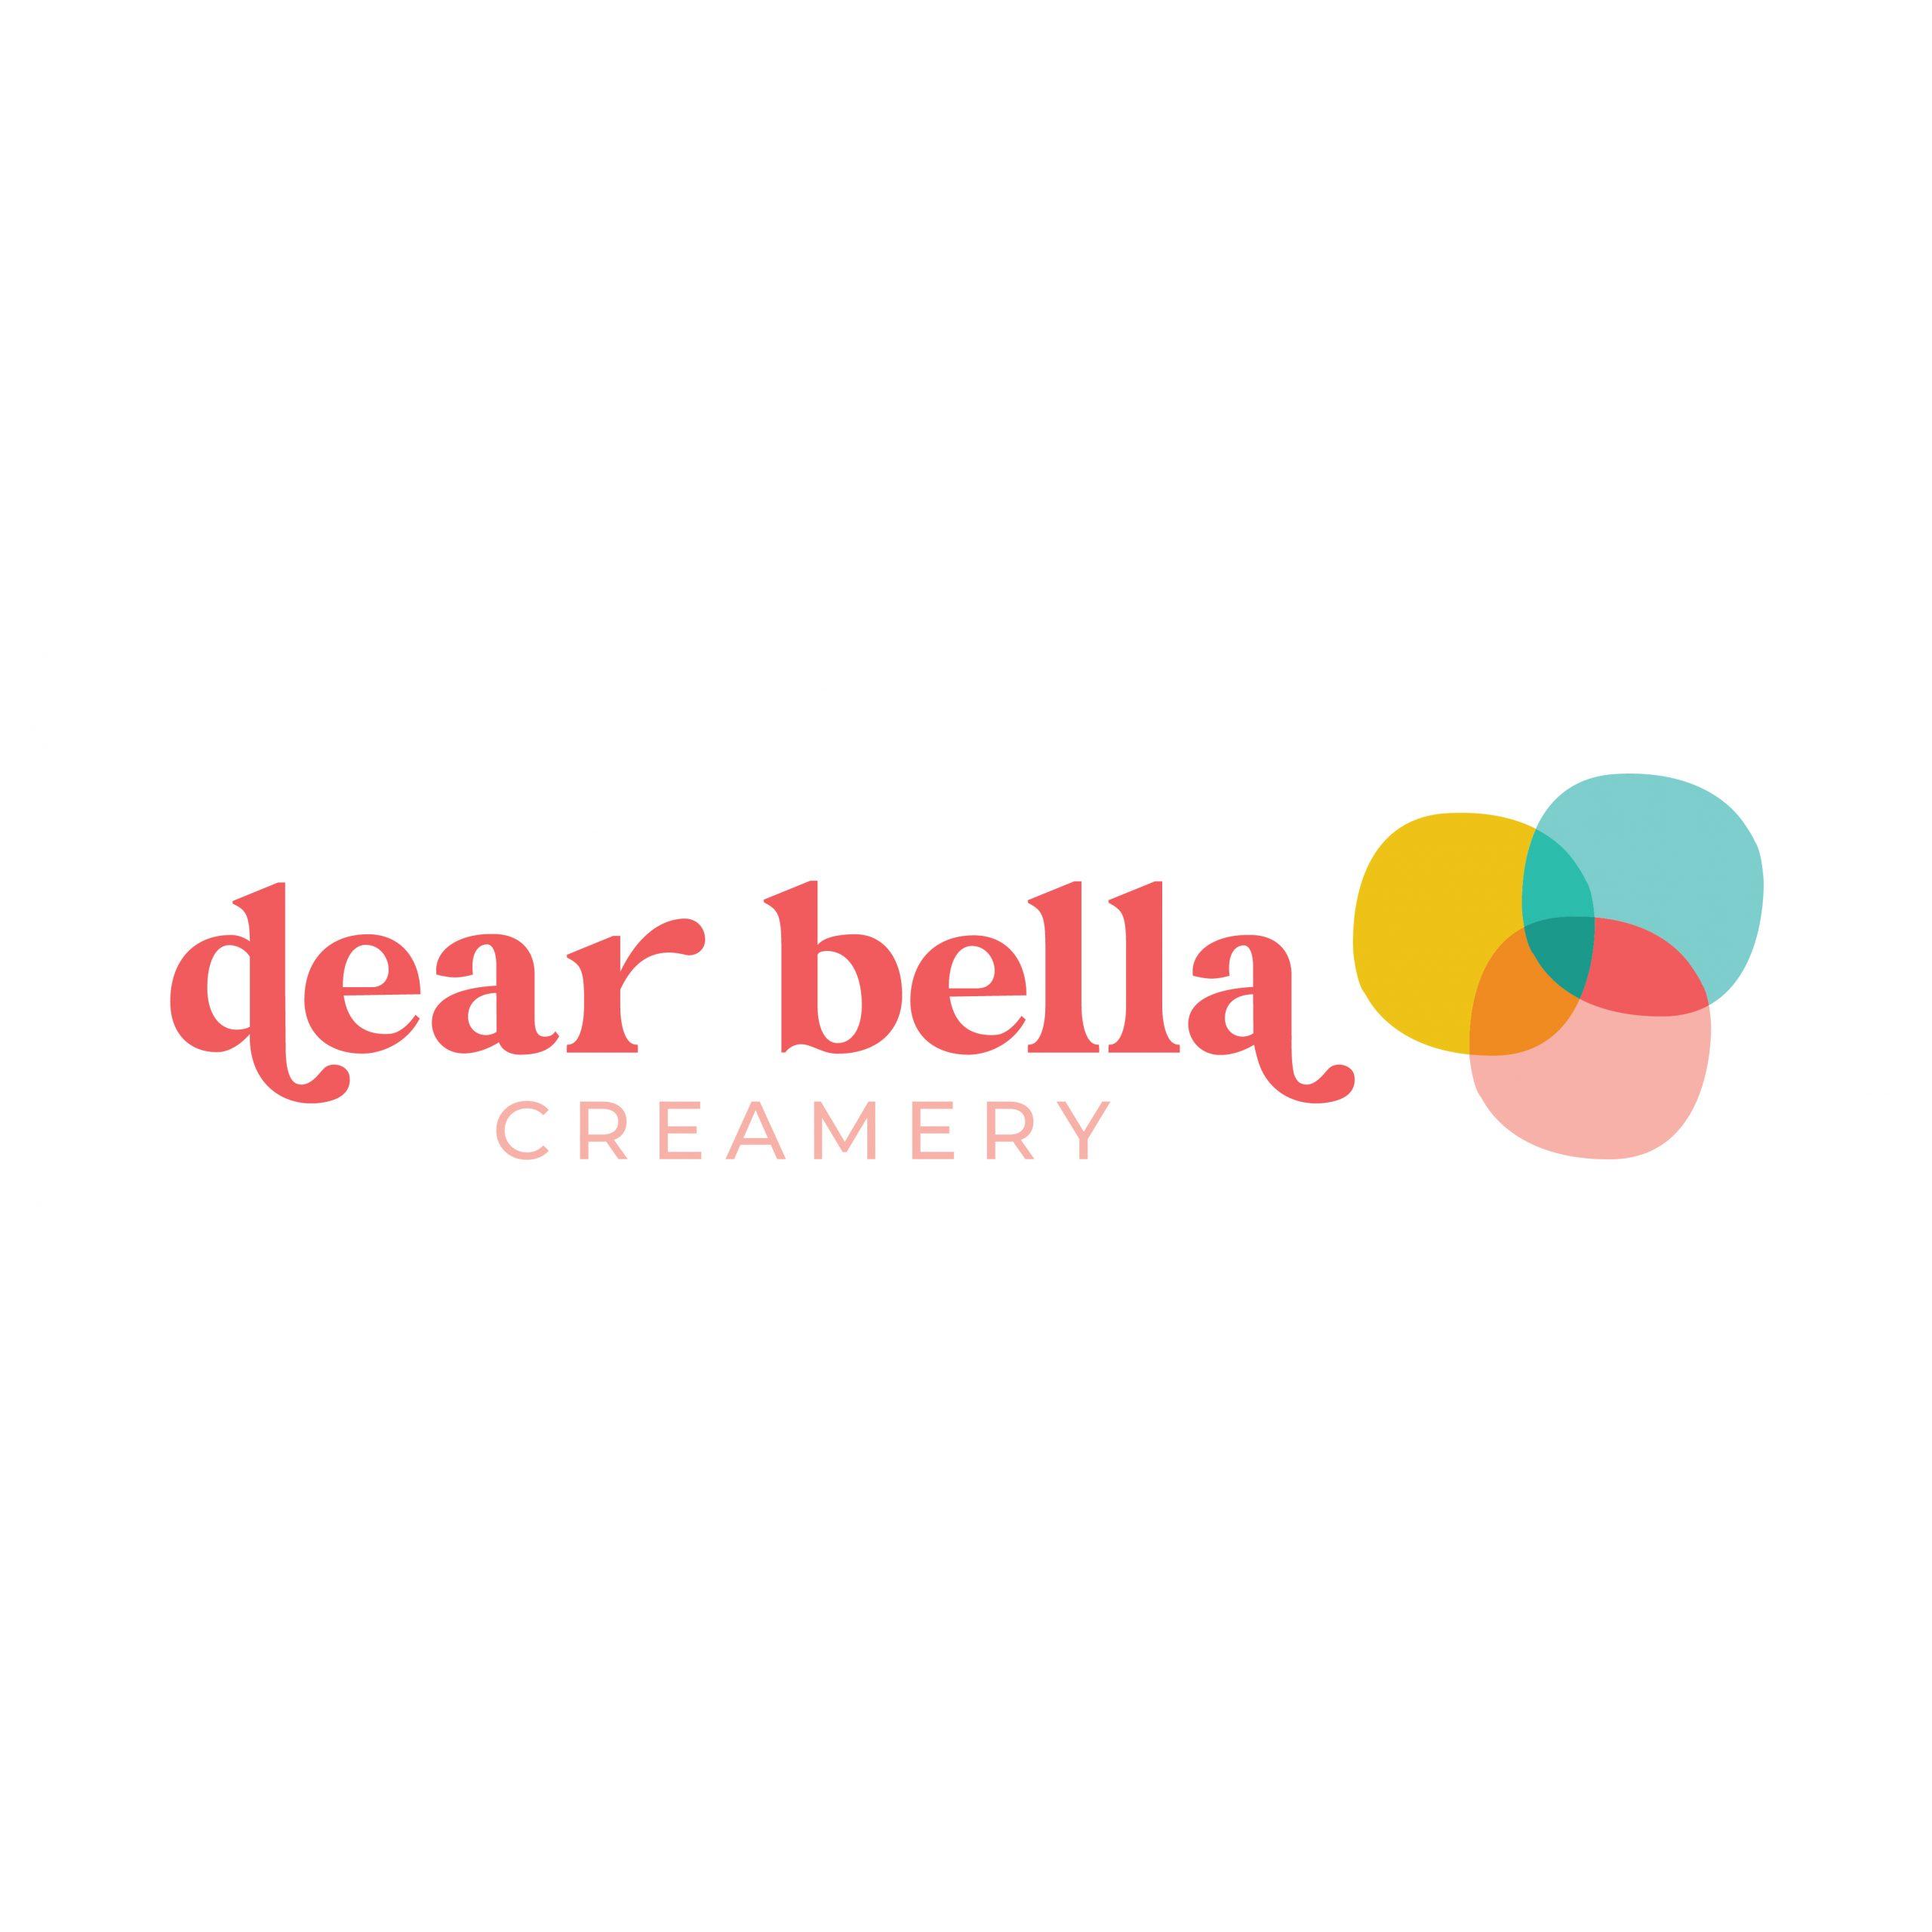 Dear Bella Creamery